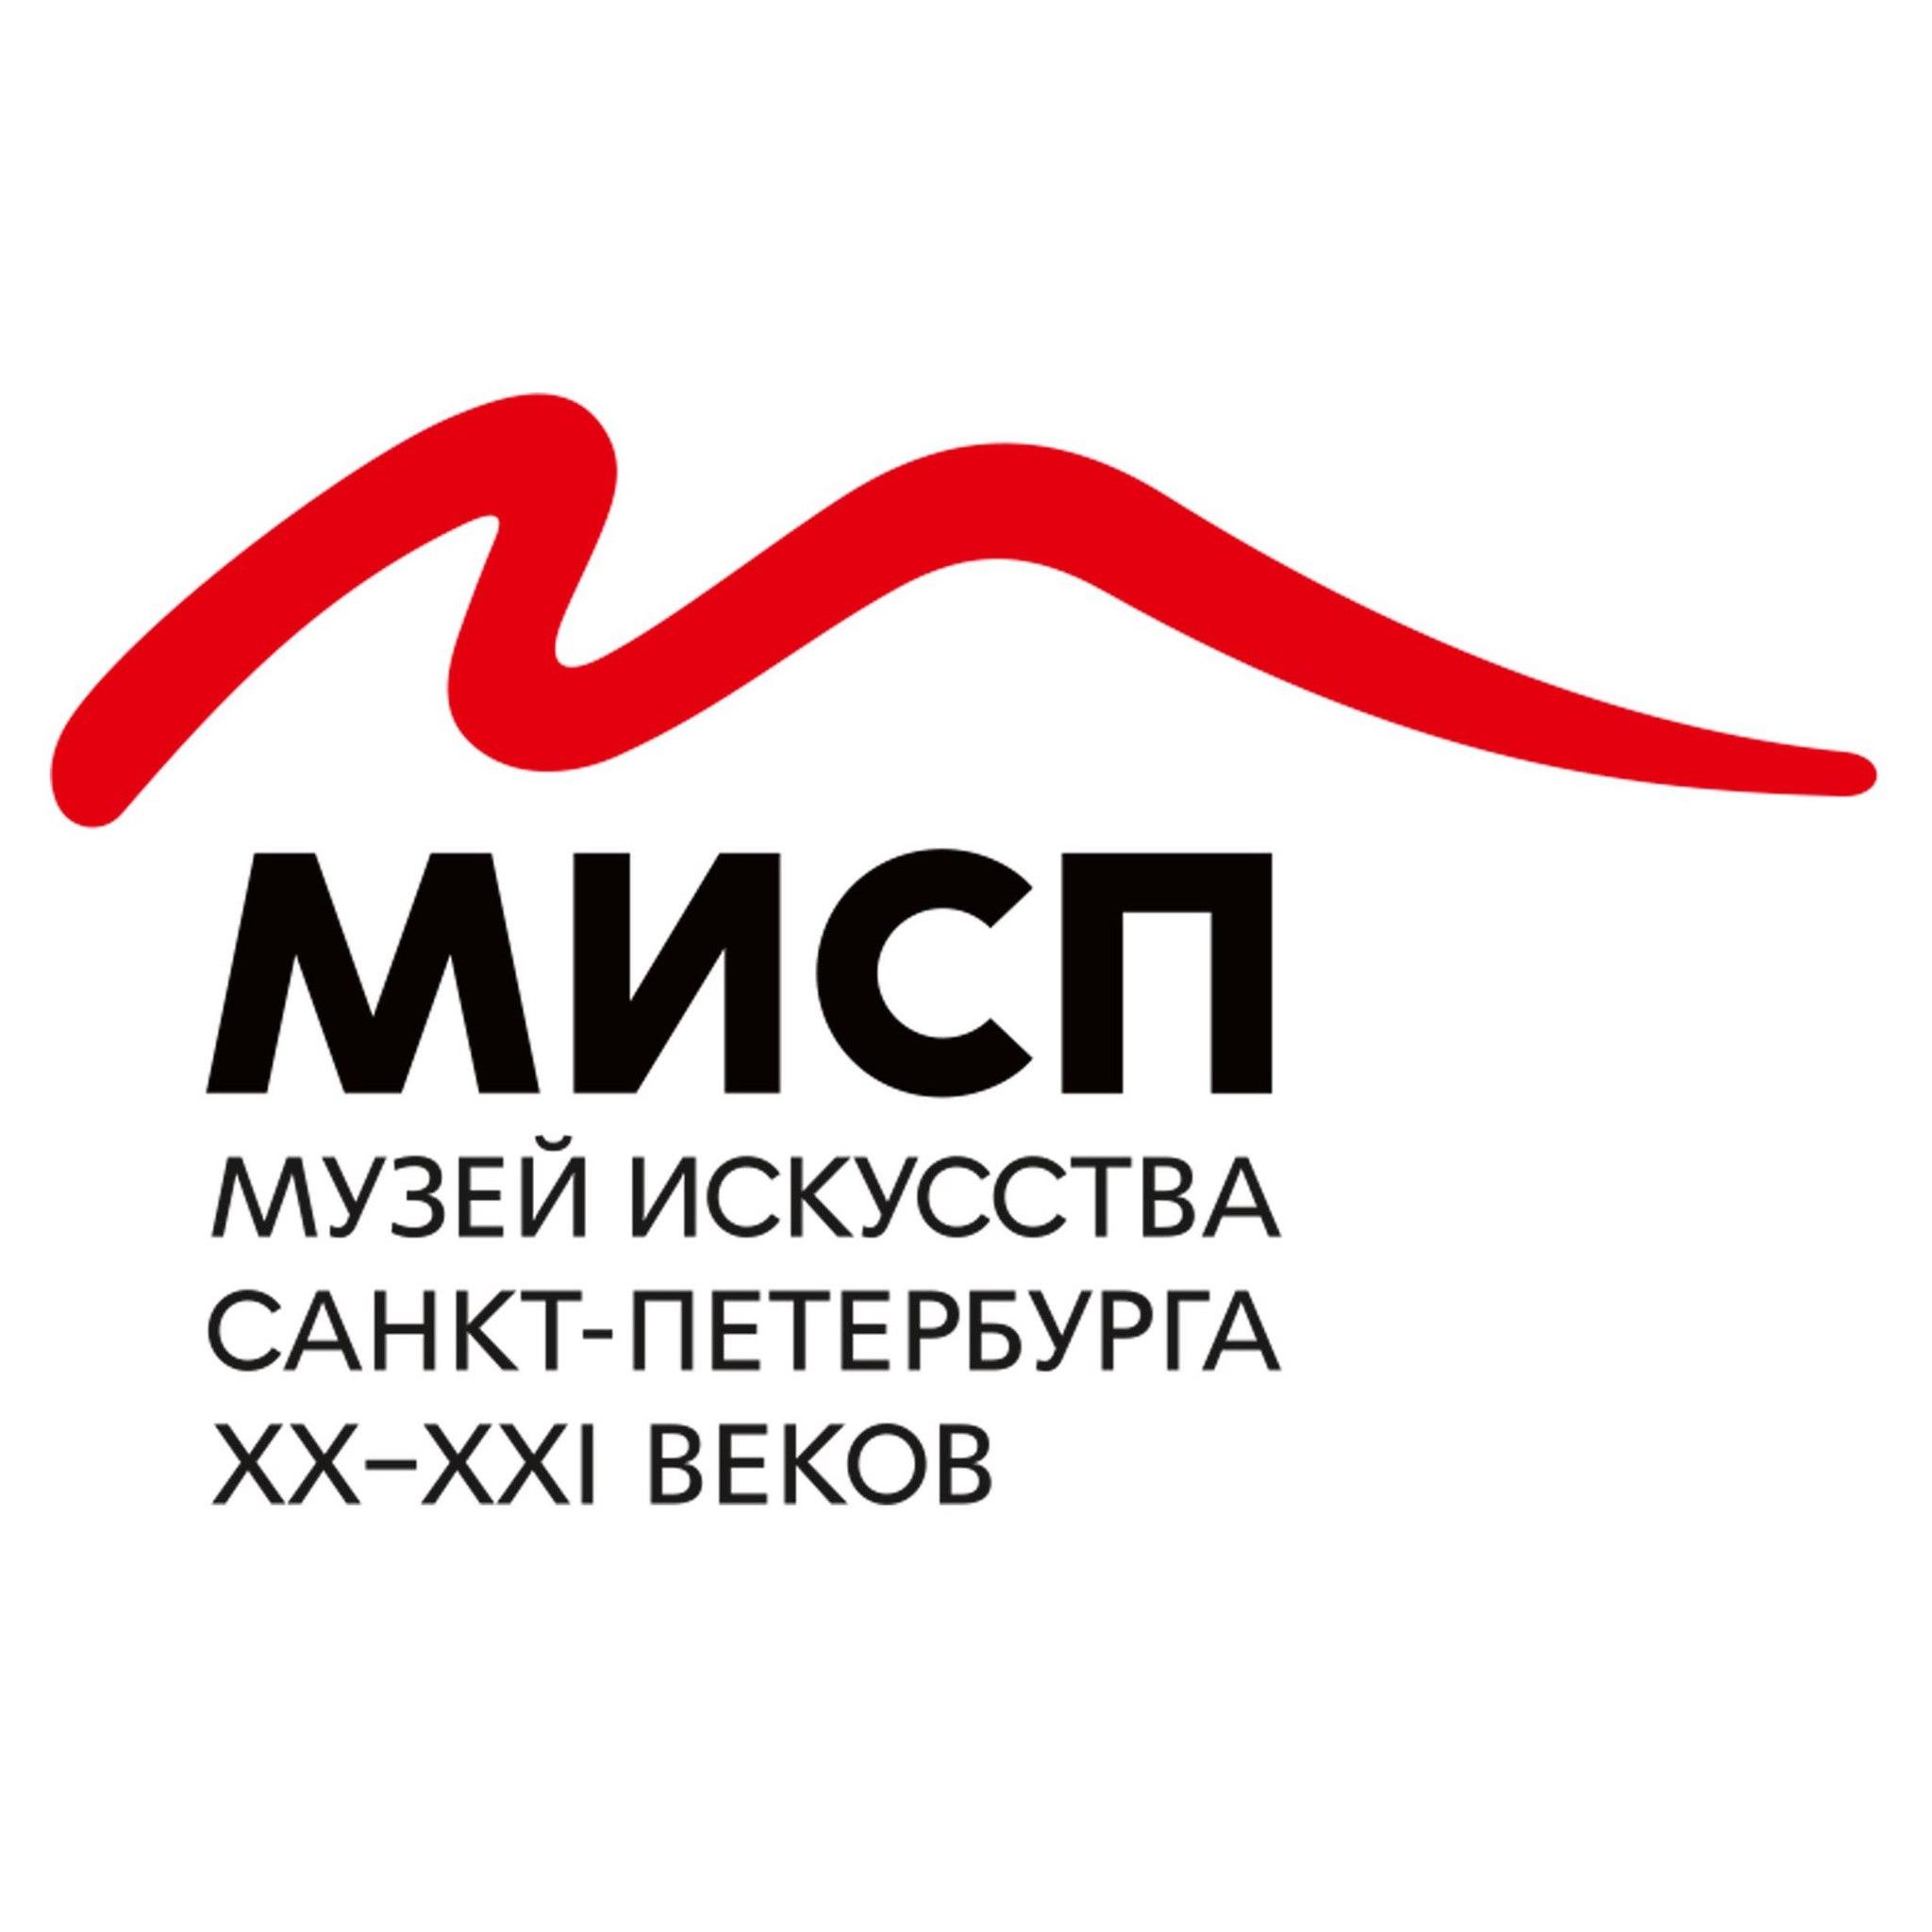 Art Museum of St. Petersburg XX-XXI centuries